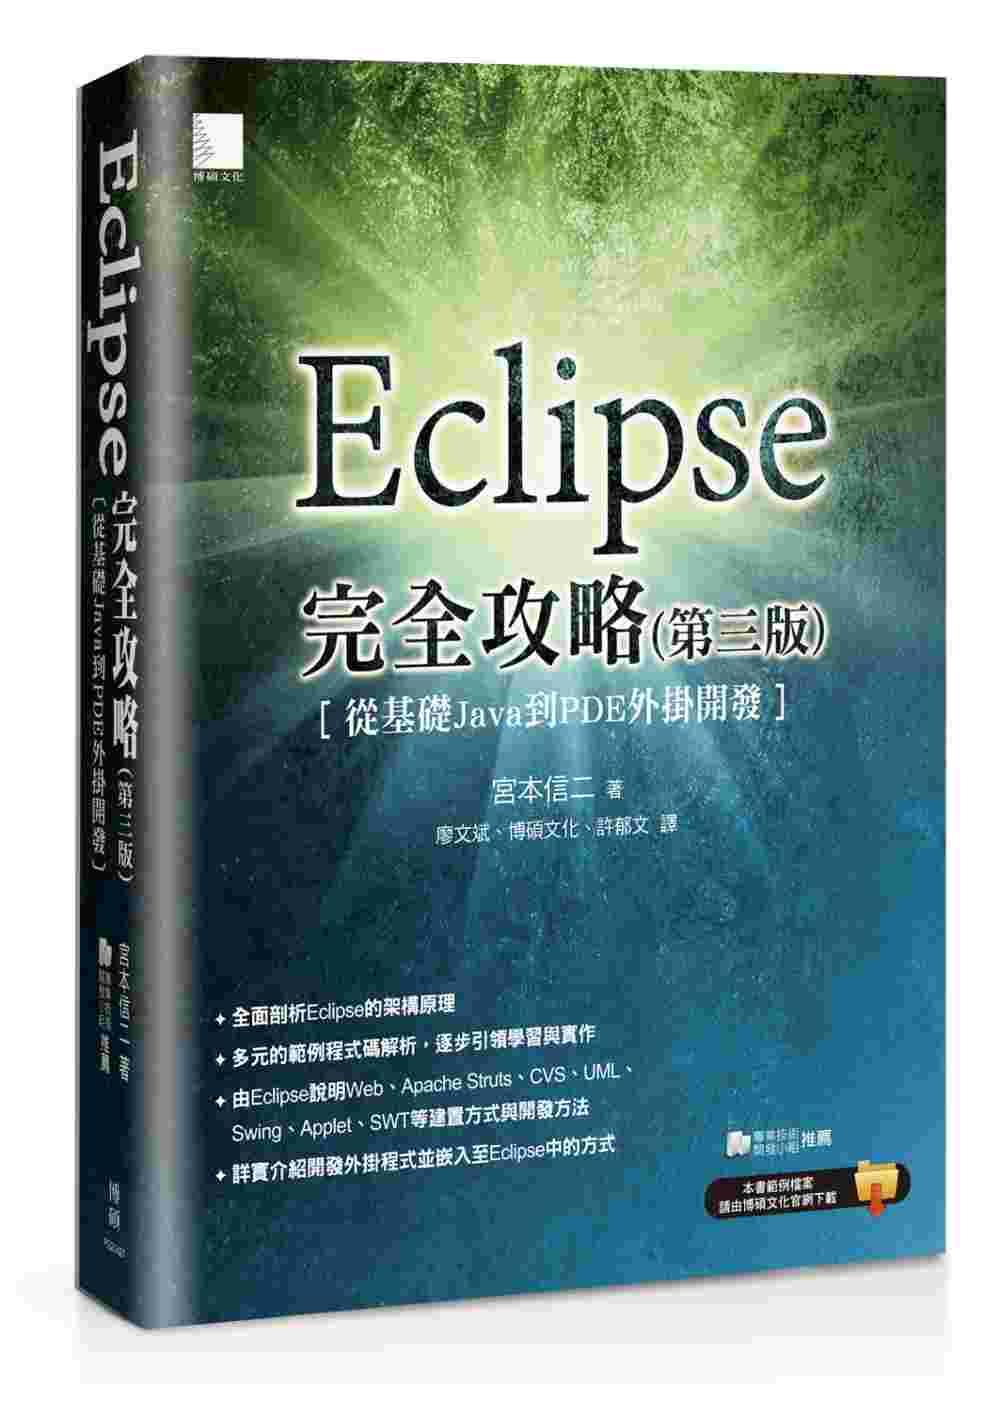 Eclipse完全攻略(第三版):從基礎Java到PDE外掛開發